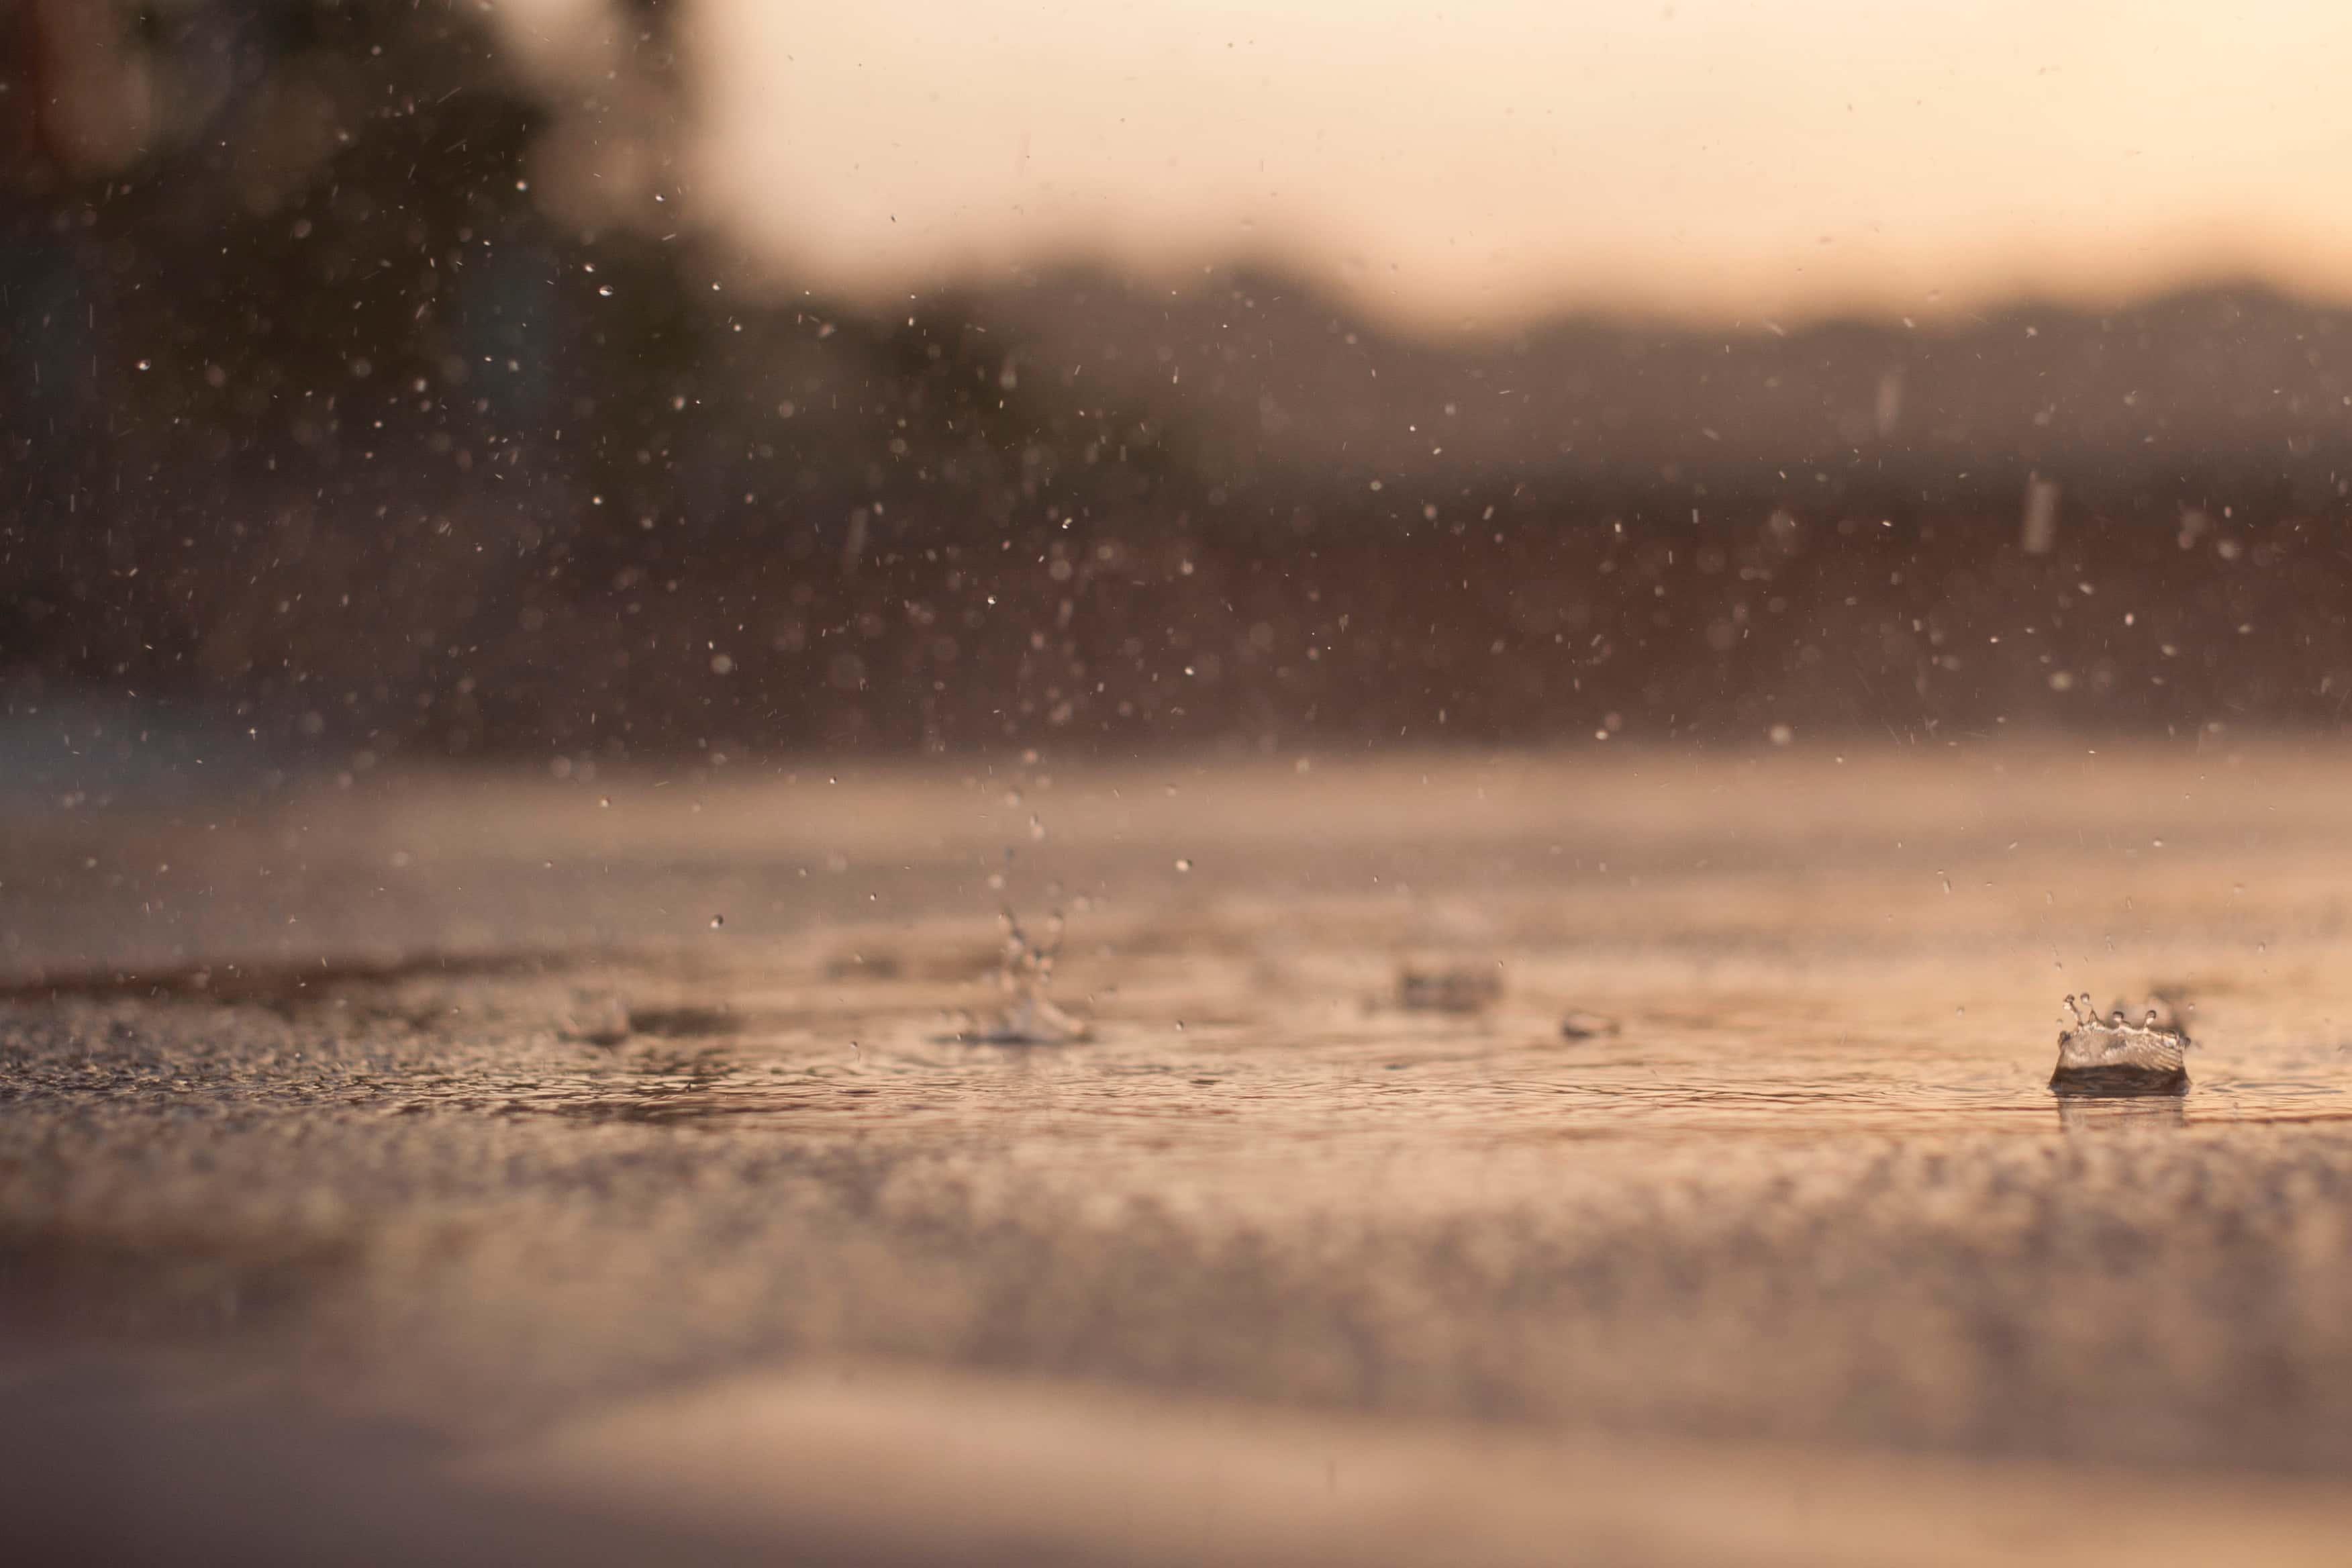 Rain Drops Falling On Street.